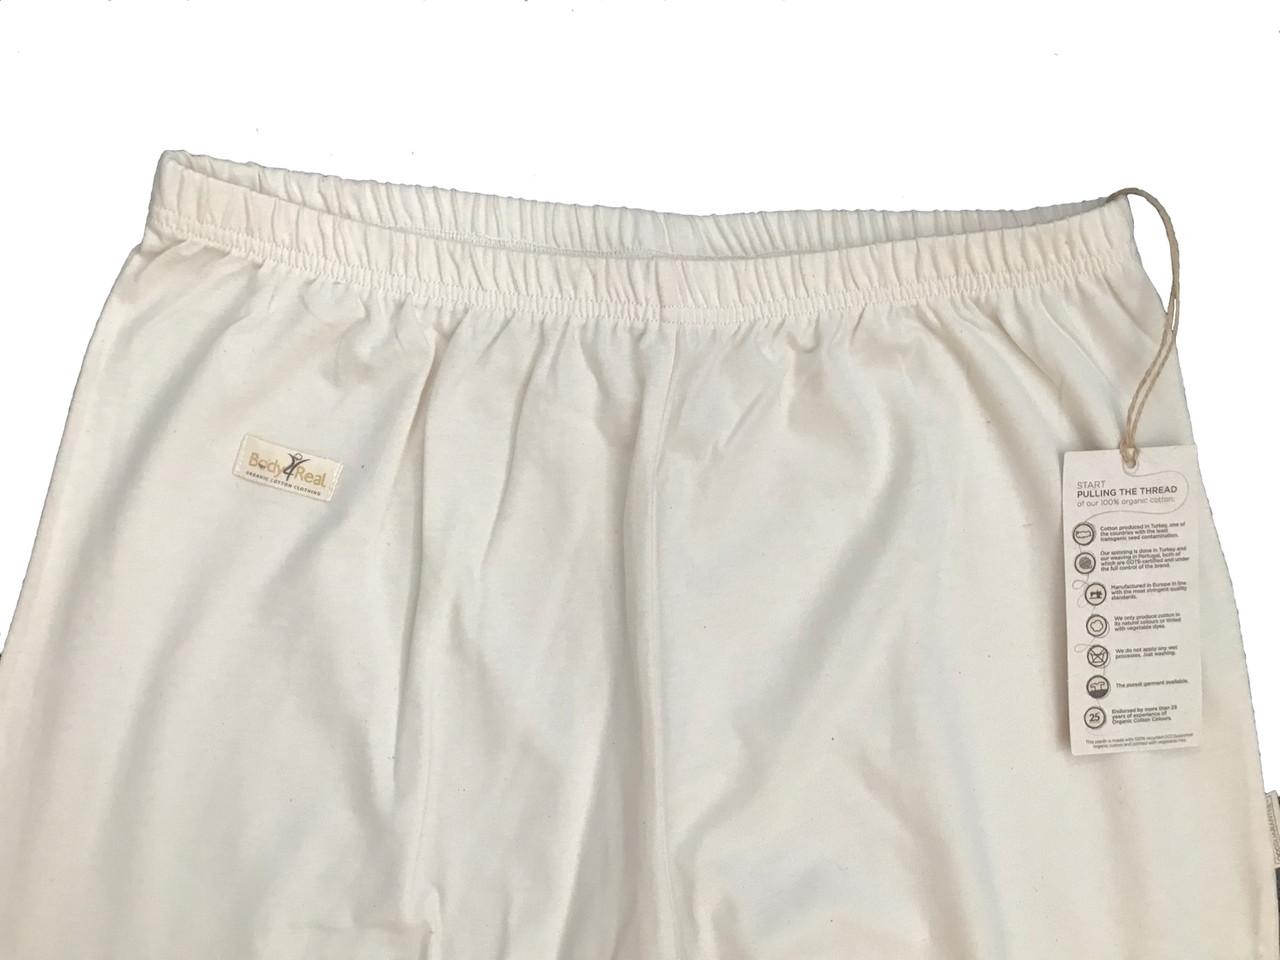 choose original shop for authentic noveldesign Body4Real Organic Cotton Mens Pyjama Bottoms - Vegan & Hypoallergenic